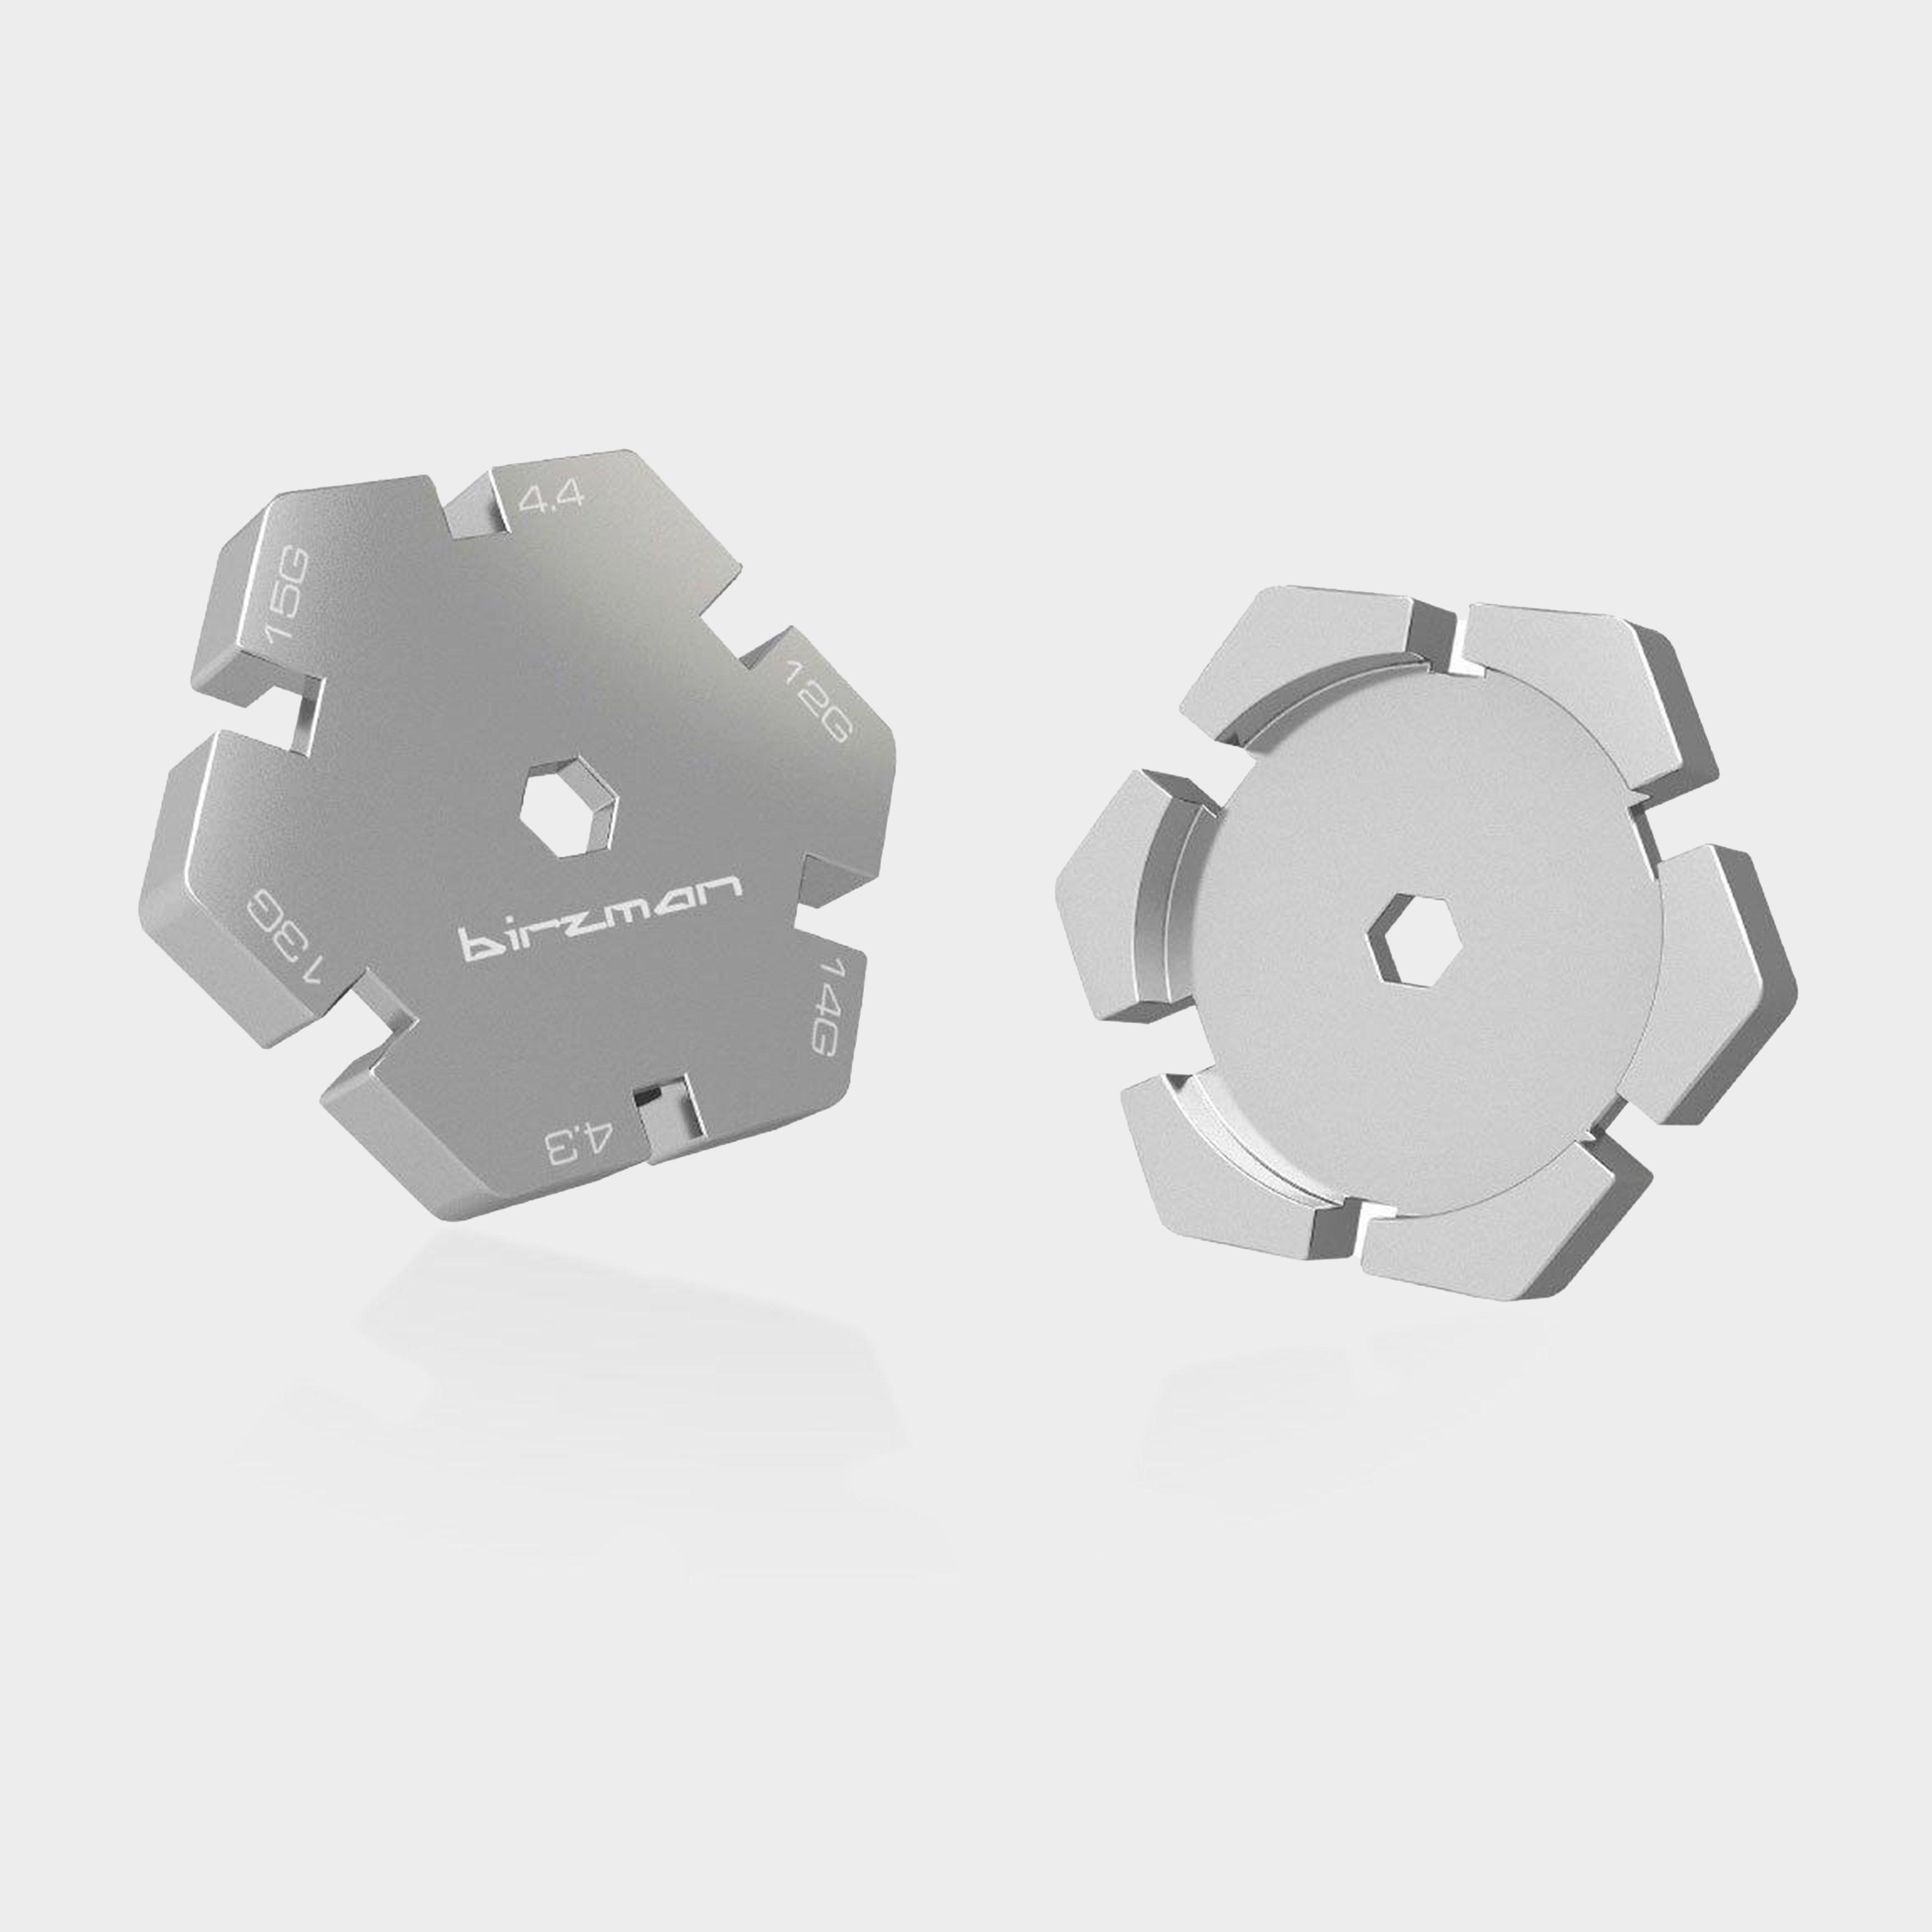 Birzman Spoke Wrench - Silver/wrench  Silver/wrench